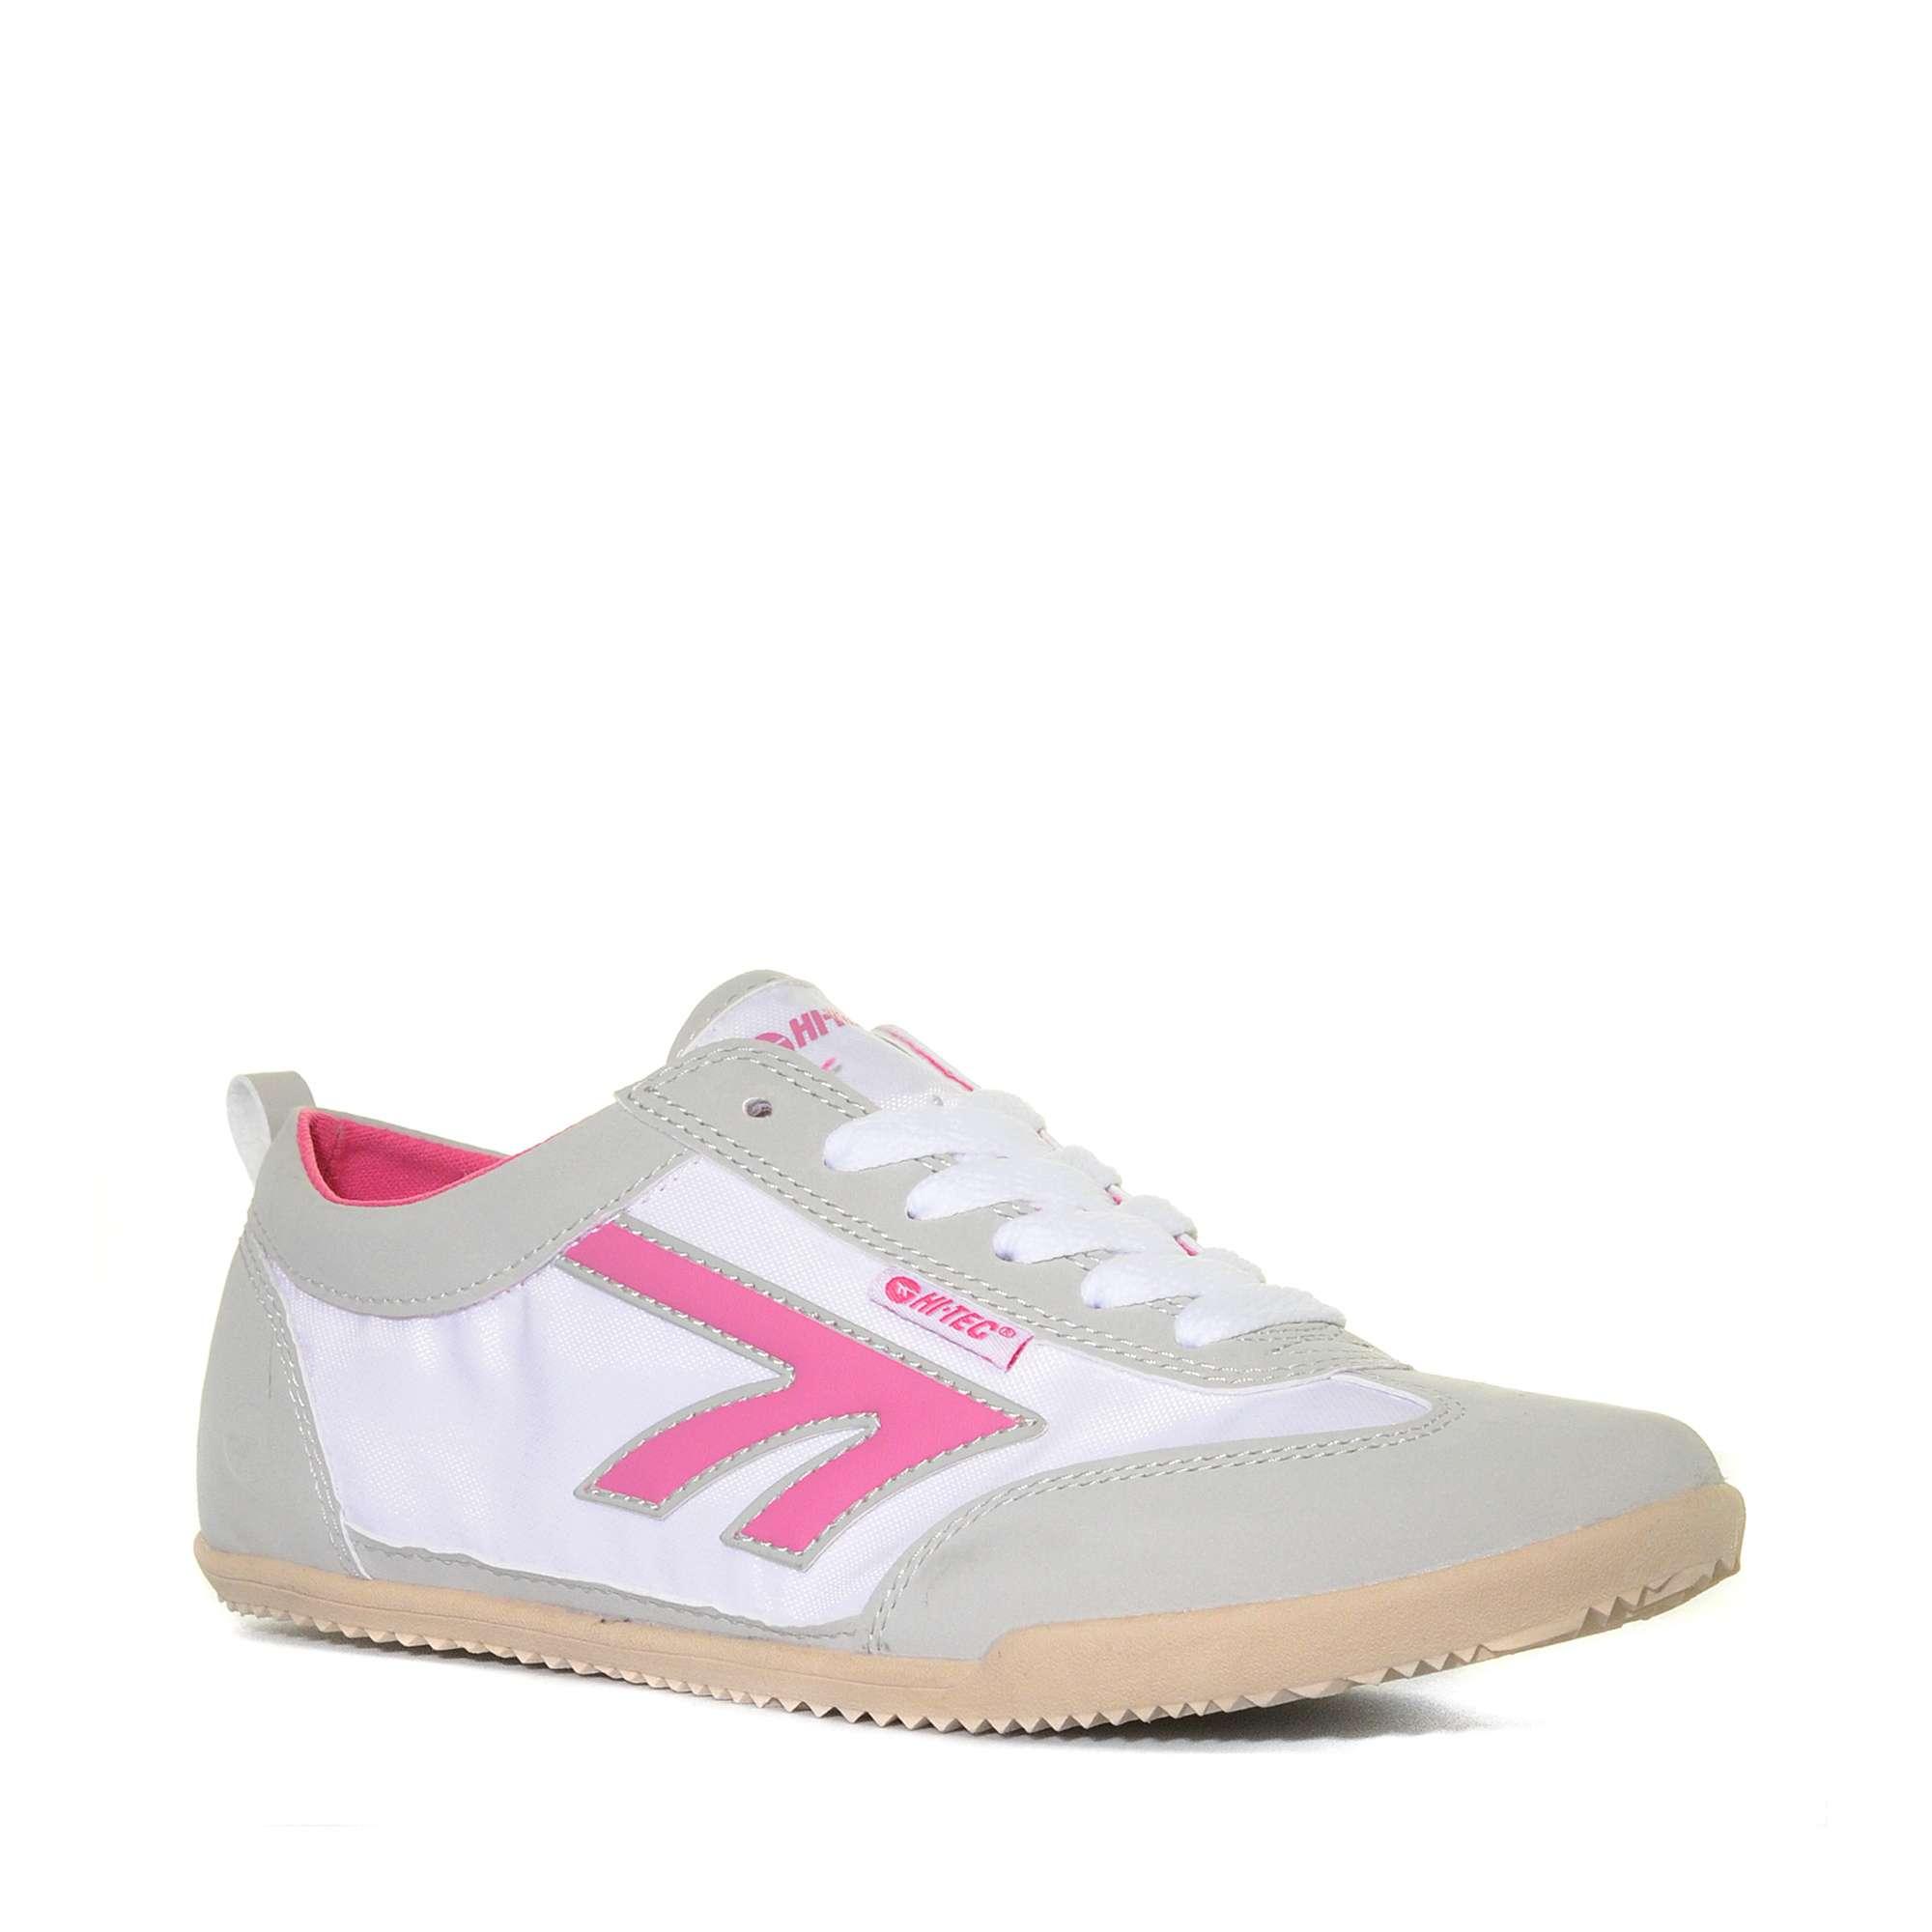 HI TEC Women's Sprint Trainer Shoe